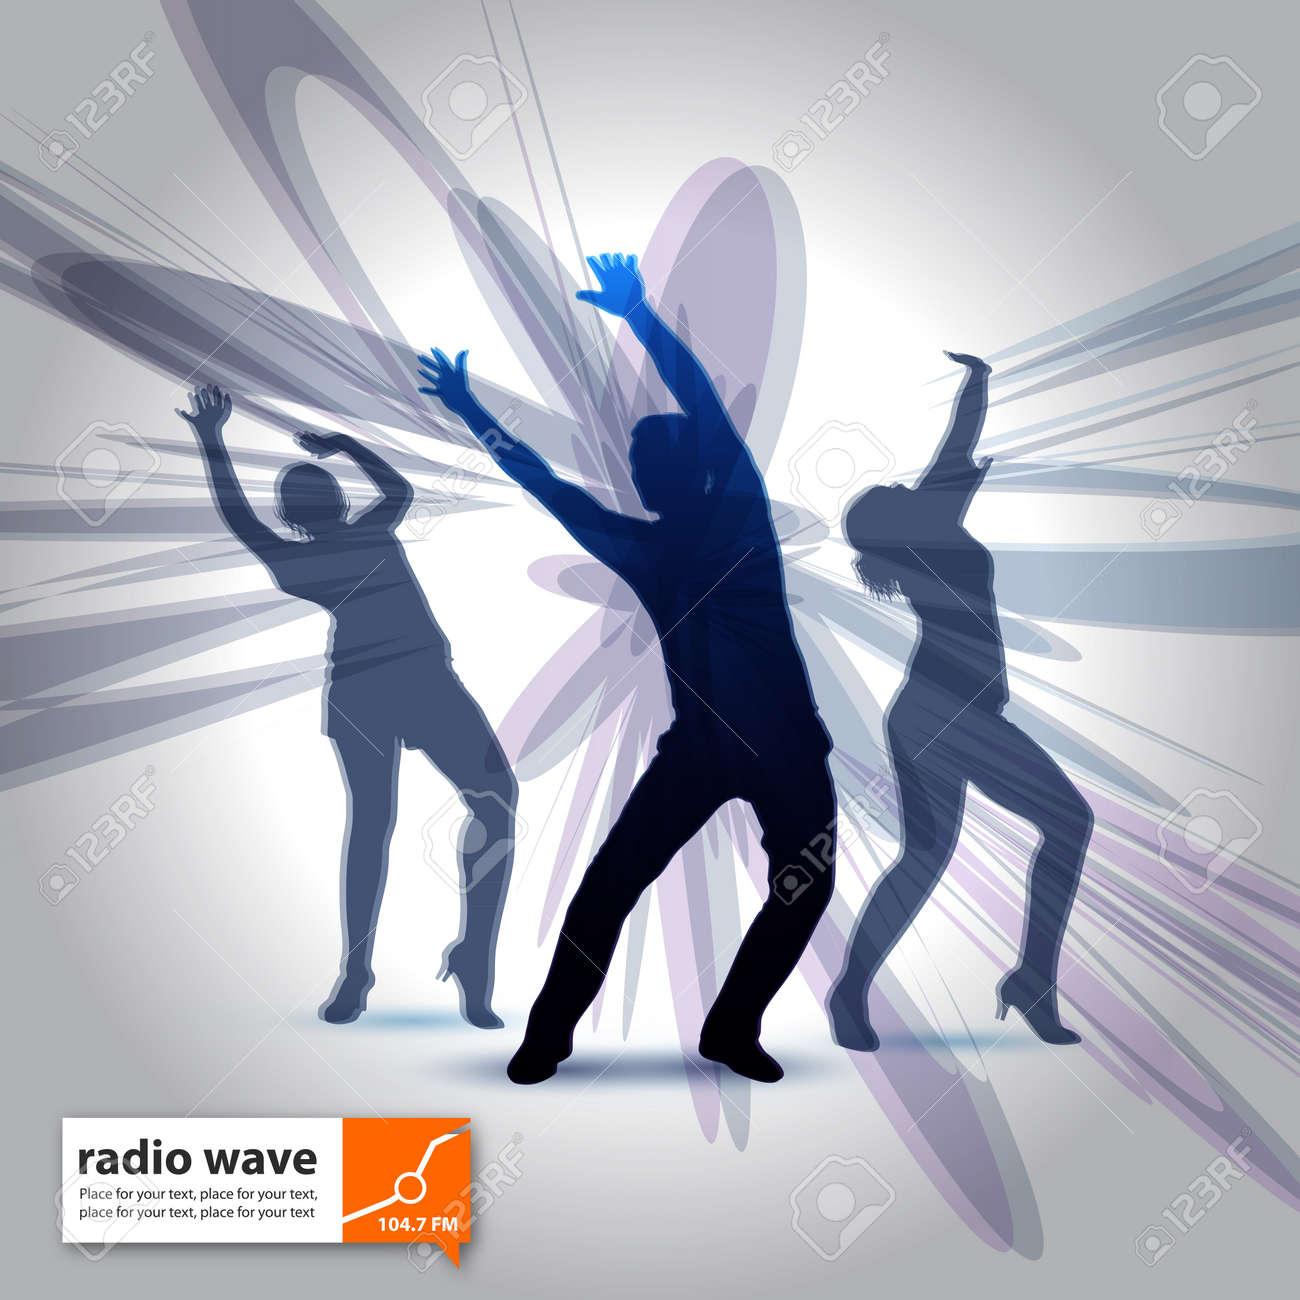 radio wave Stock Vector - 16643100